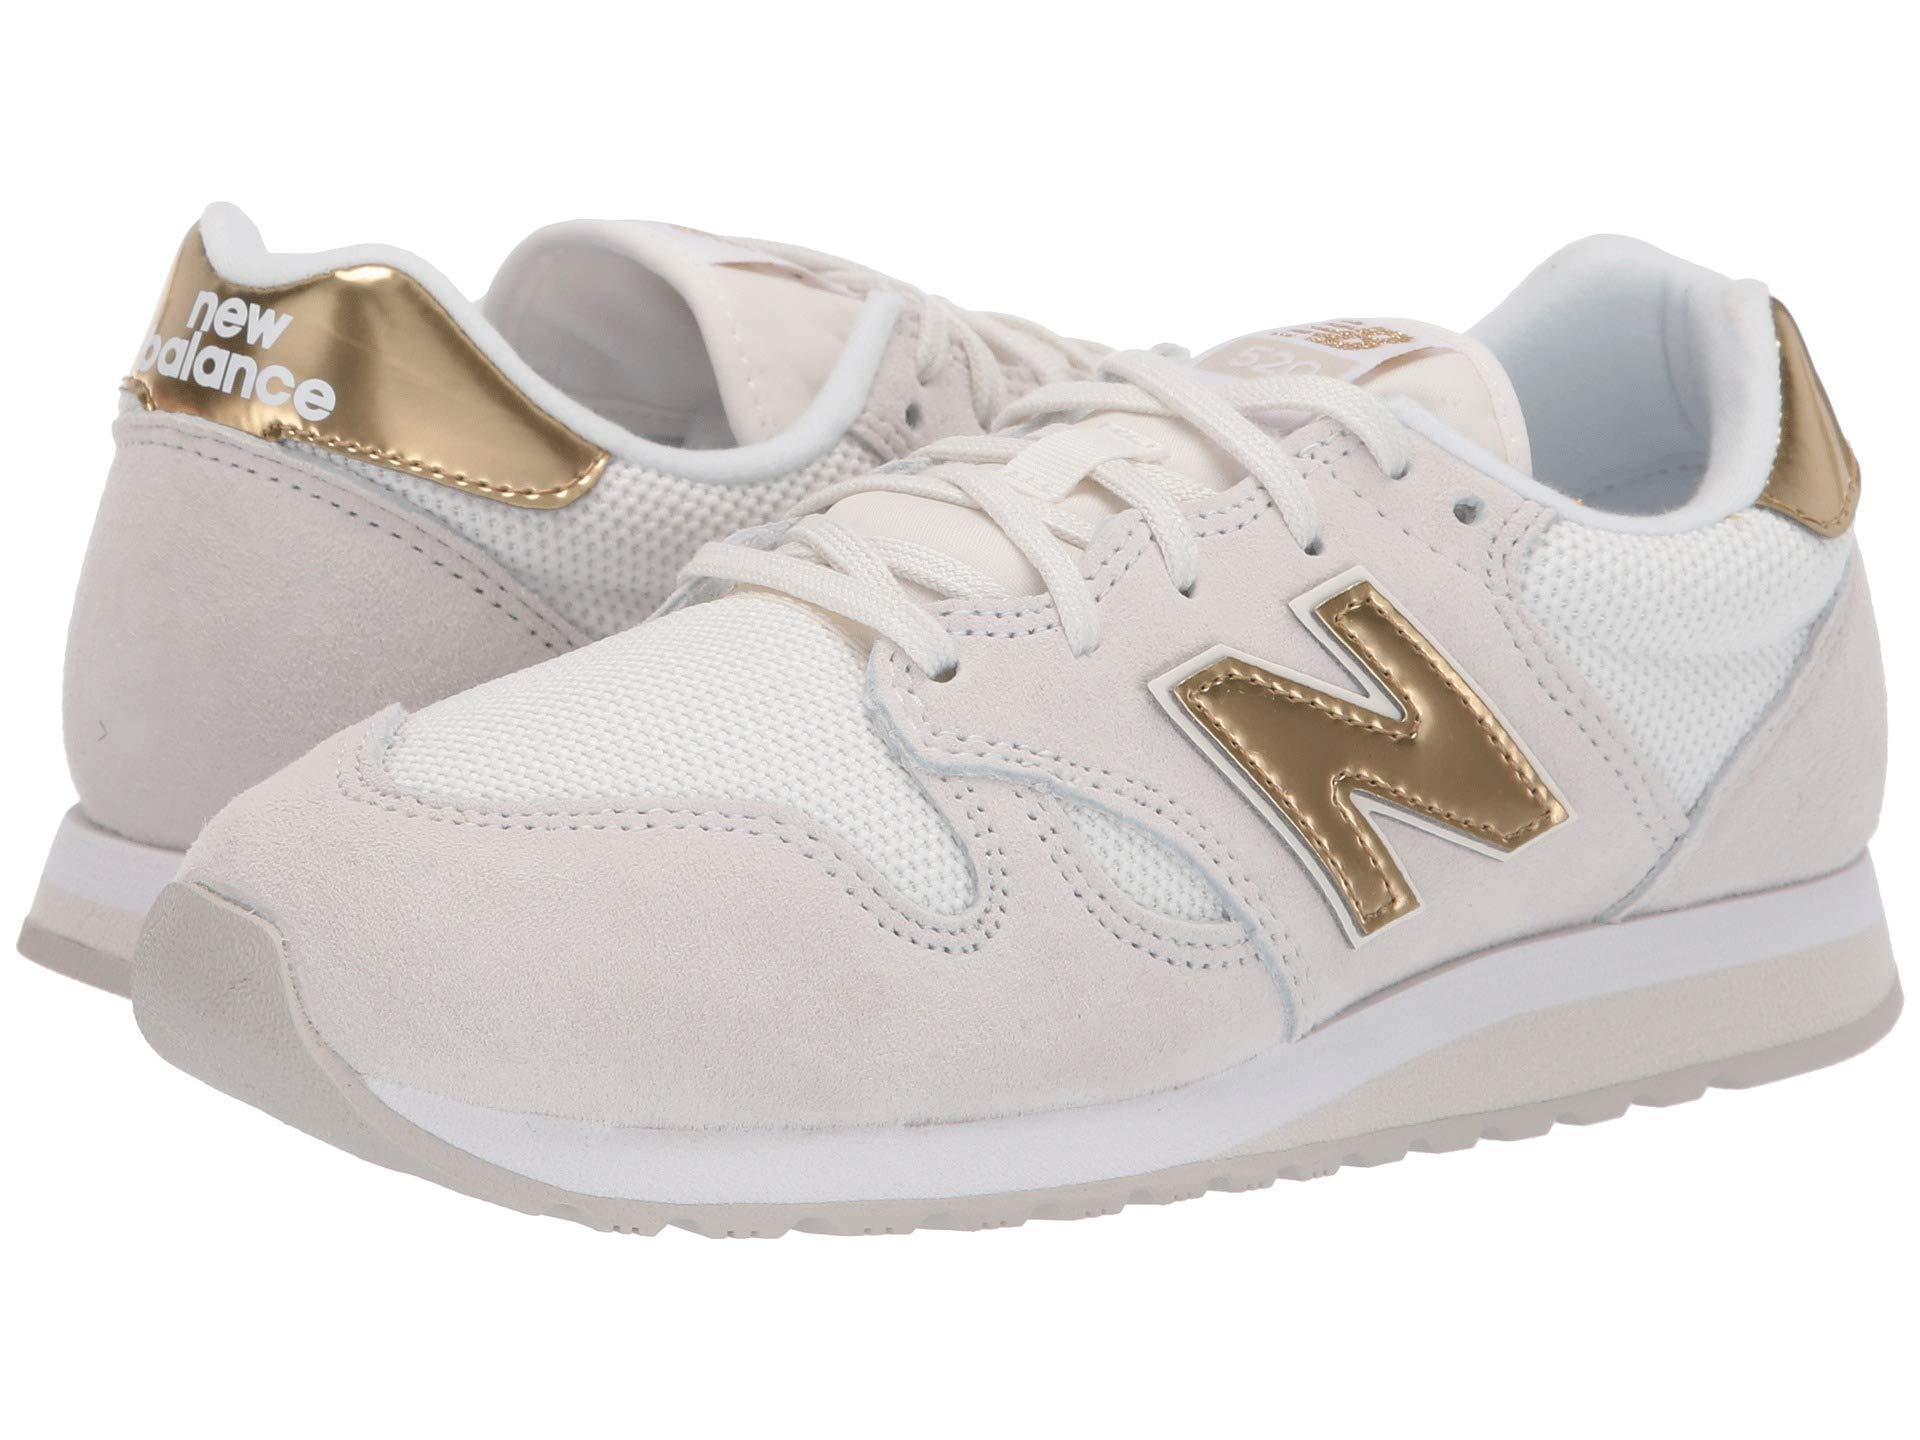 New Balance Suede 5201-usa (sea Salt/classic Gold) Women's Shoes ...